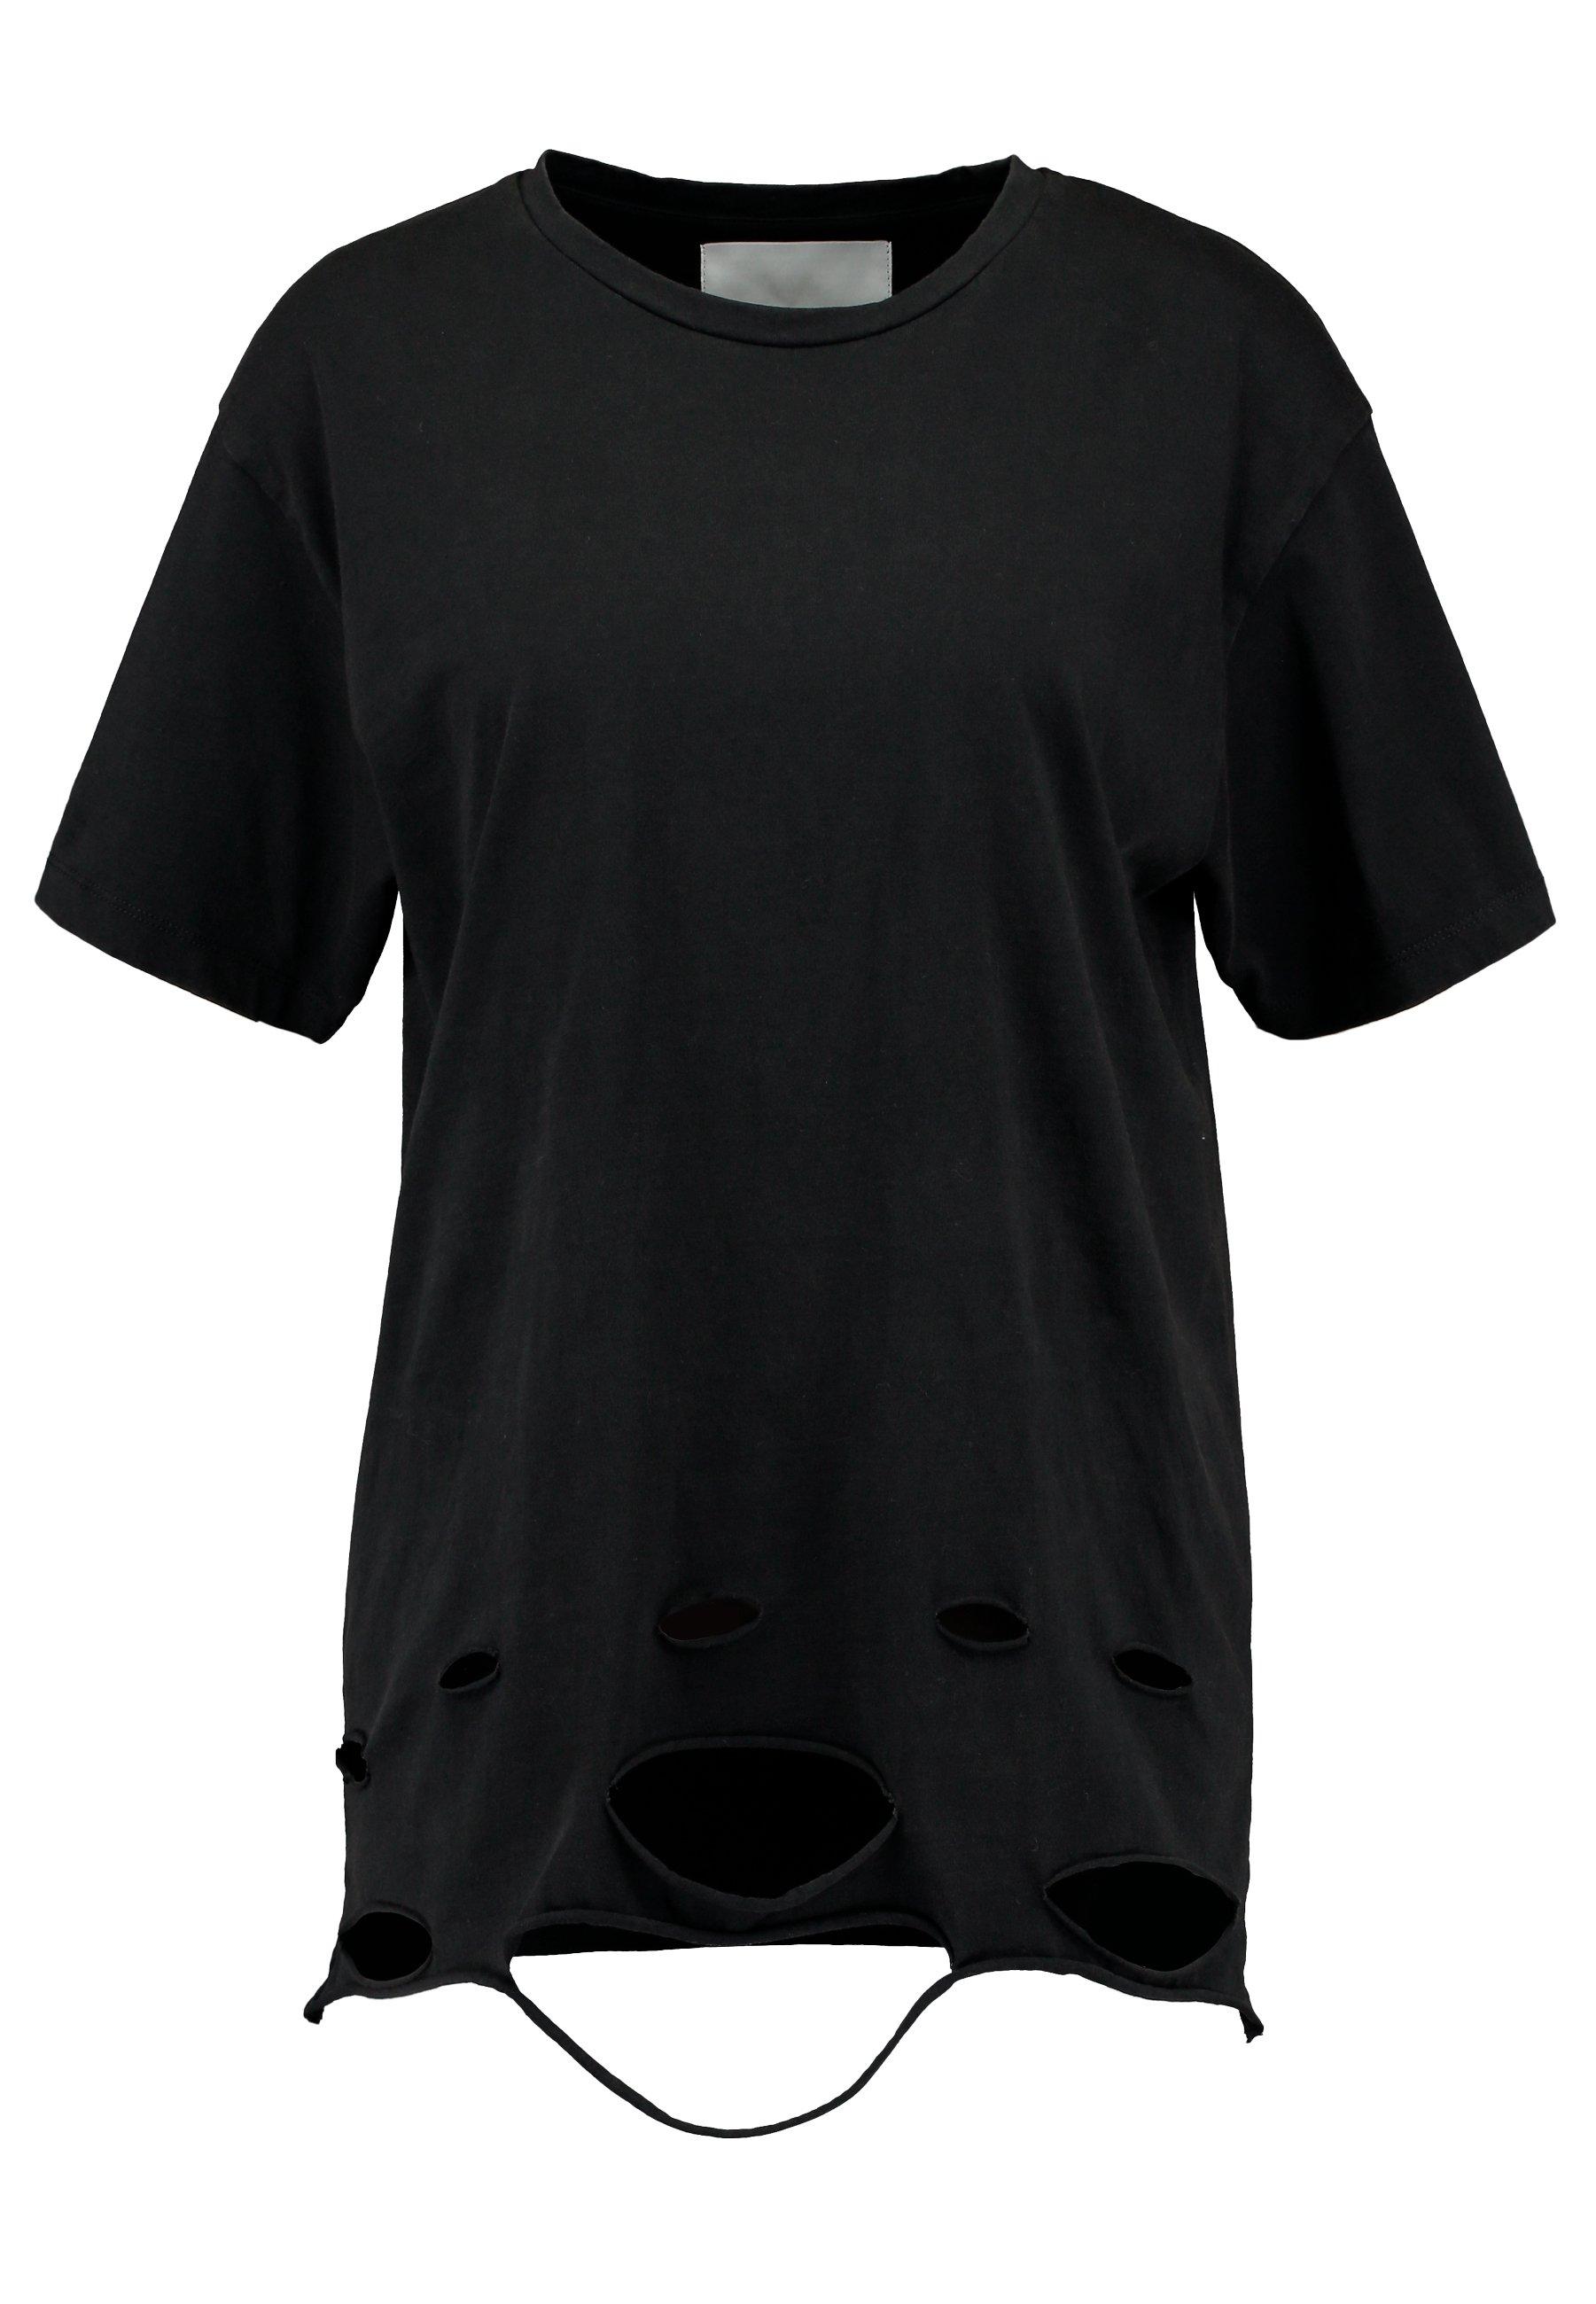 Nghtbrd Player Tee - T-shirts Med Print Vintage Black/svart